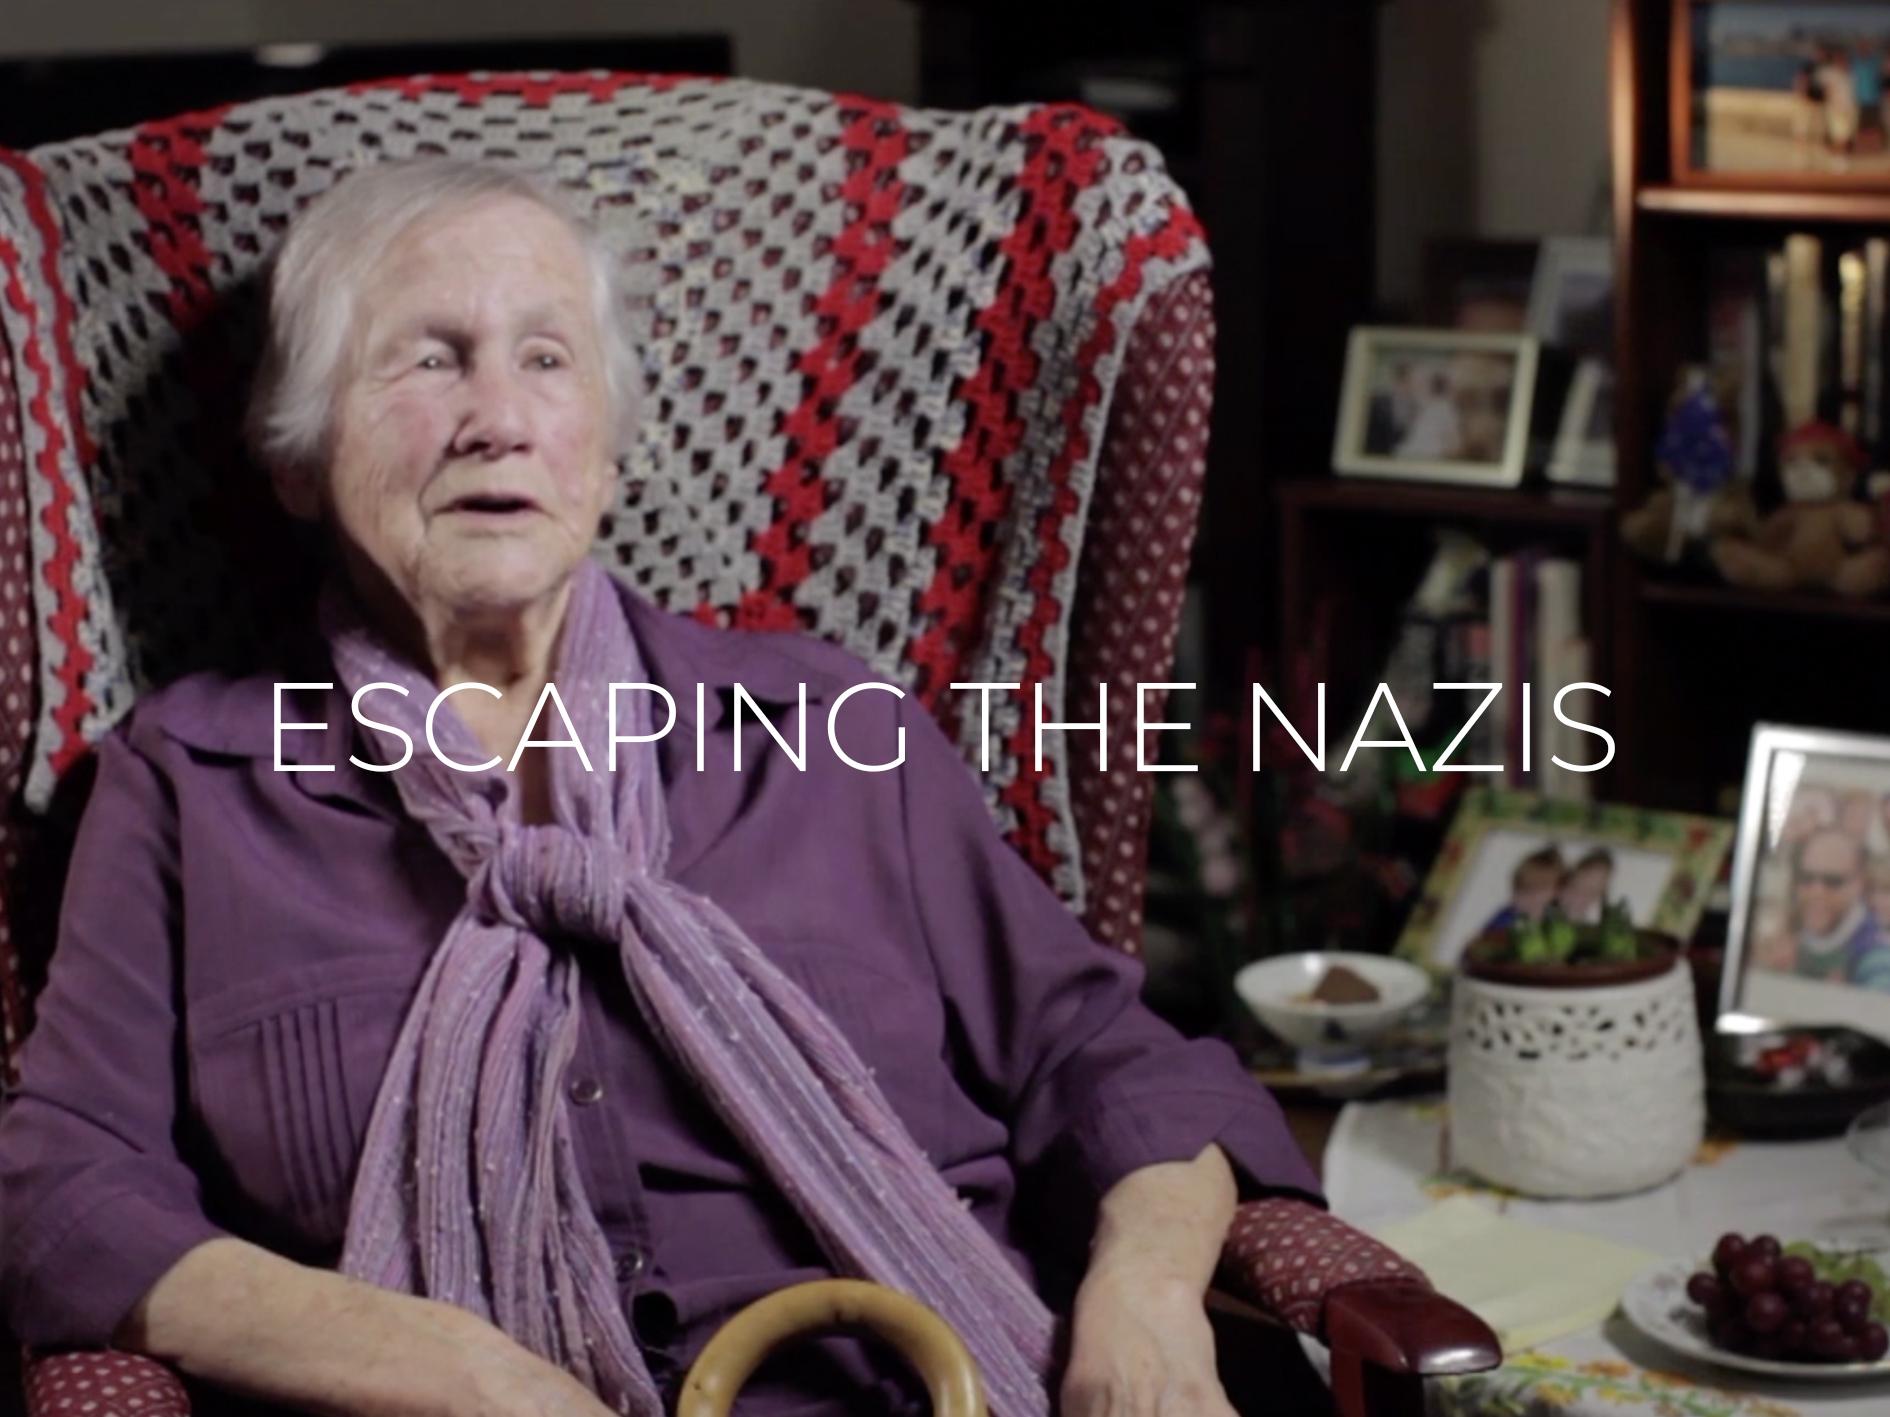 Escaping The Nazis Thumbnail.jpg